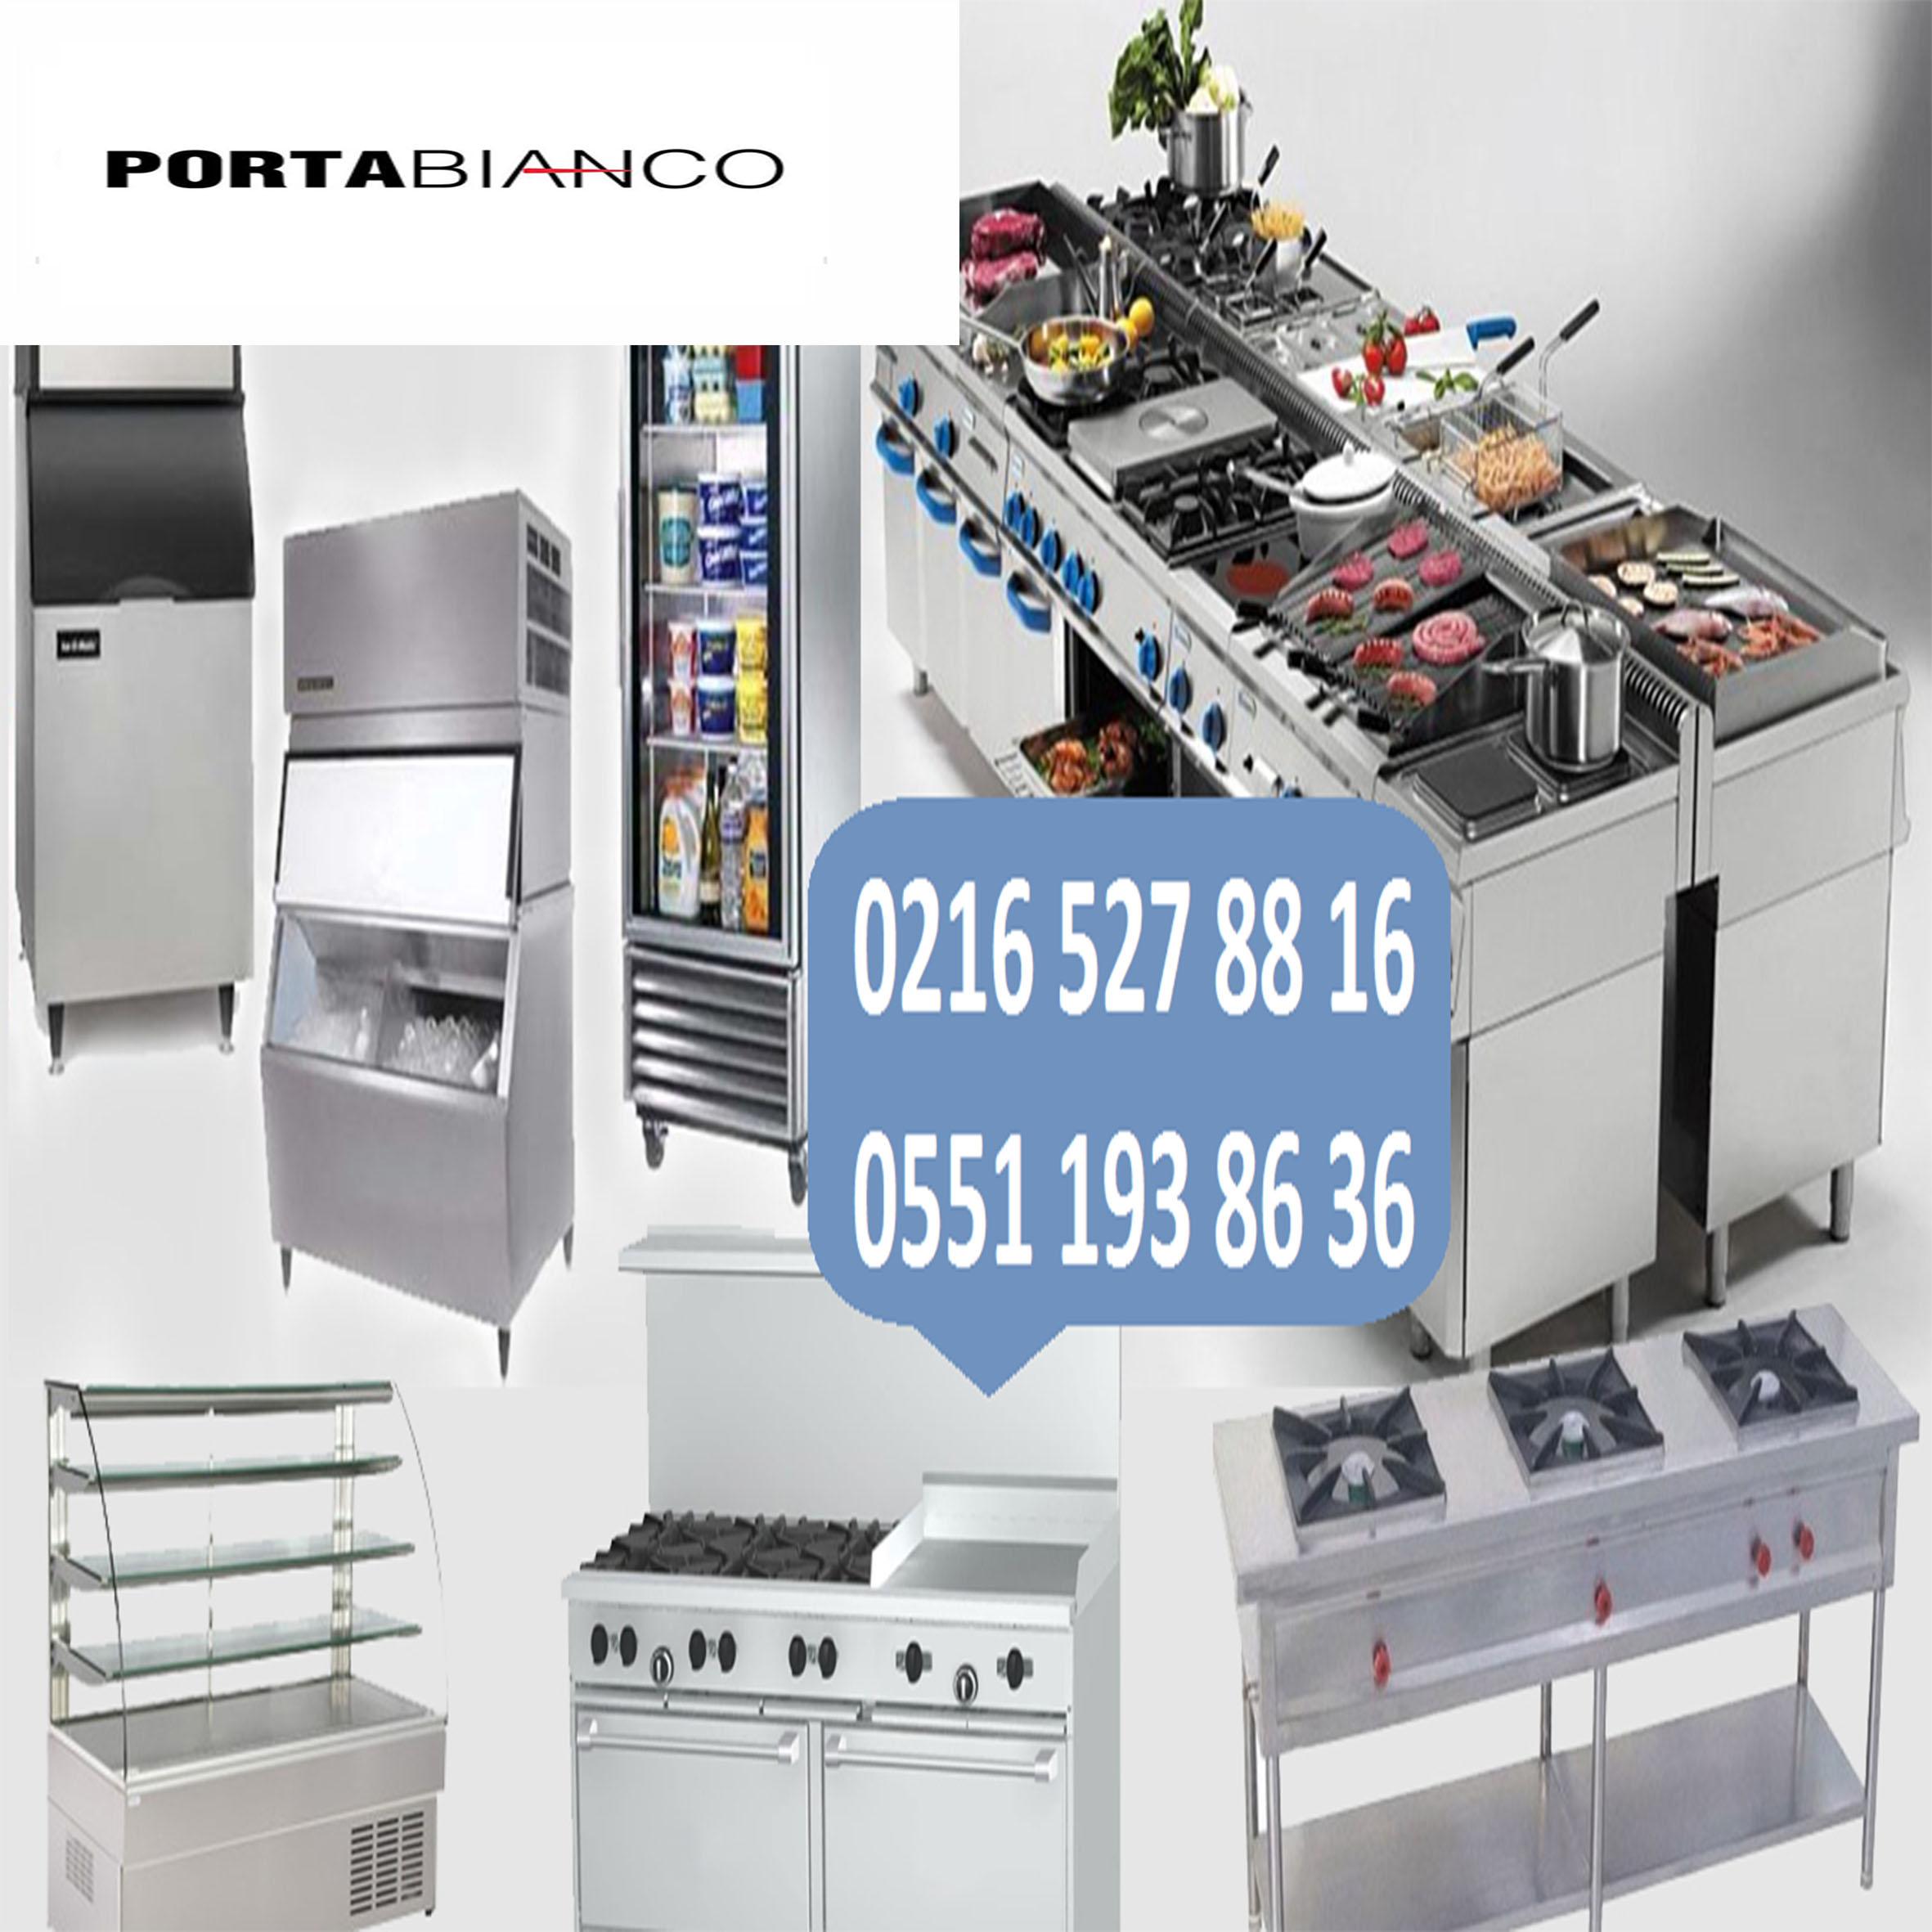 Şile Portabianco Bulaşık Makinesi Servisi